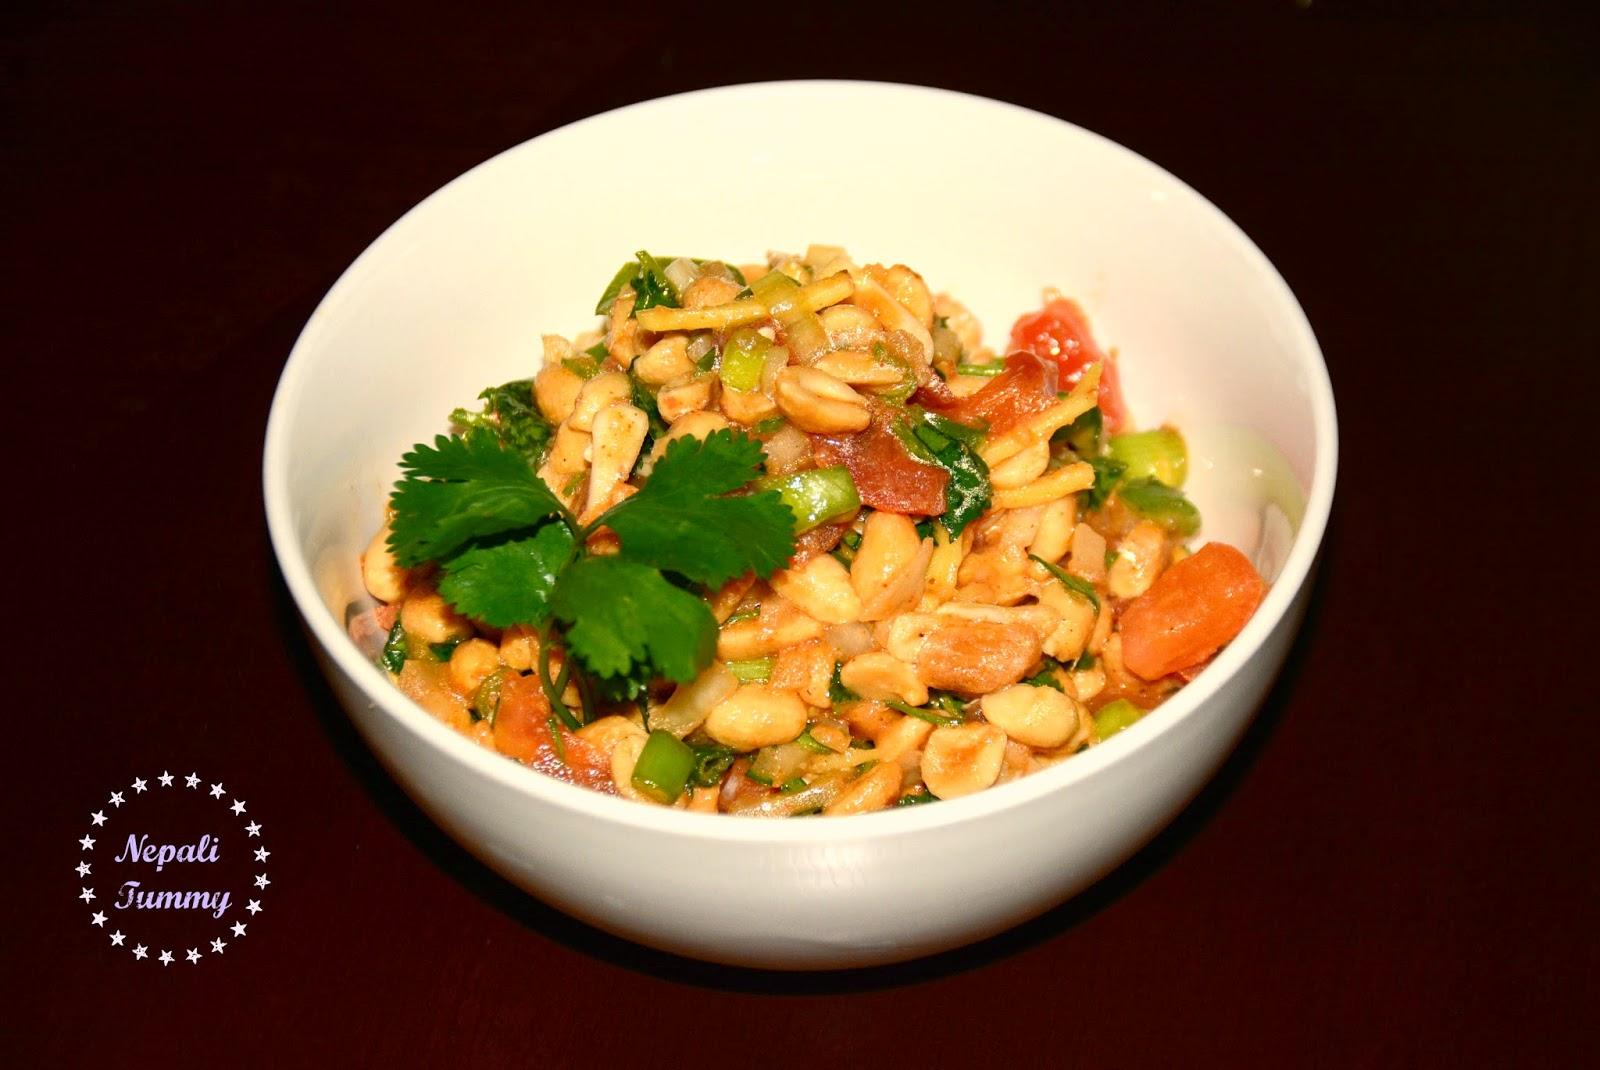 Nepali Tummy!!: Badam Sadeko (Spicy Peanut Salad/Salsa) Recipe!!